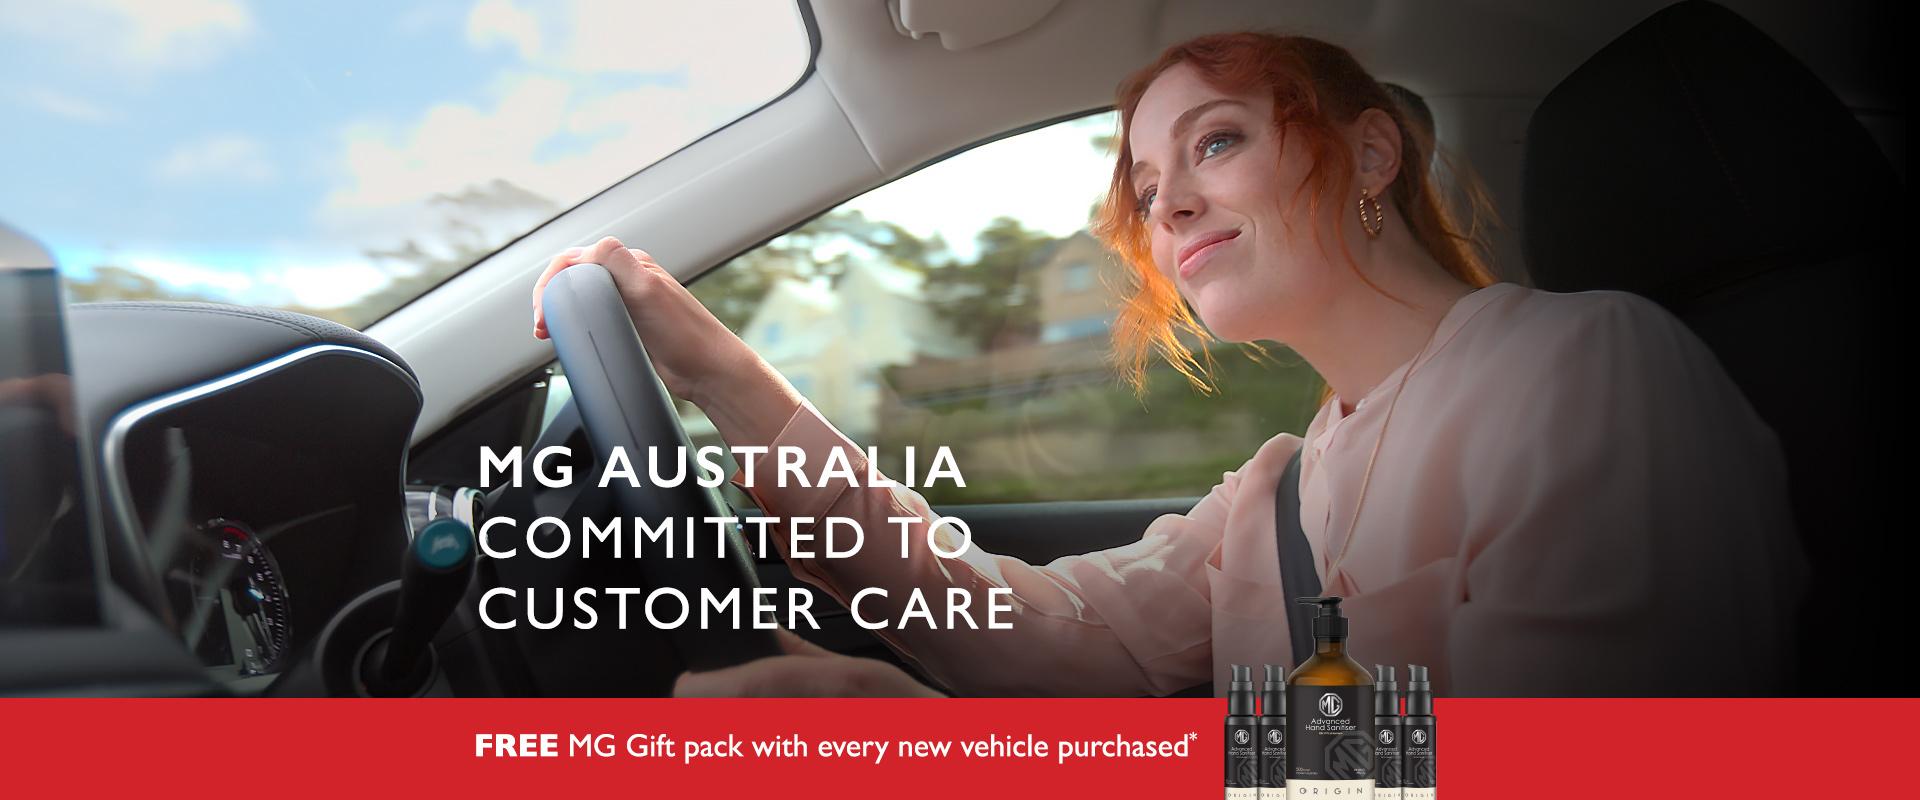 MG Sanitization Pack Offer